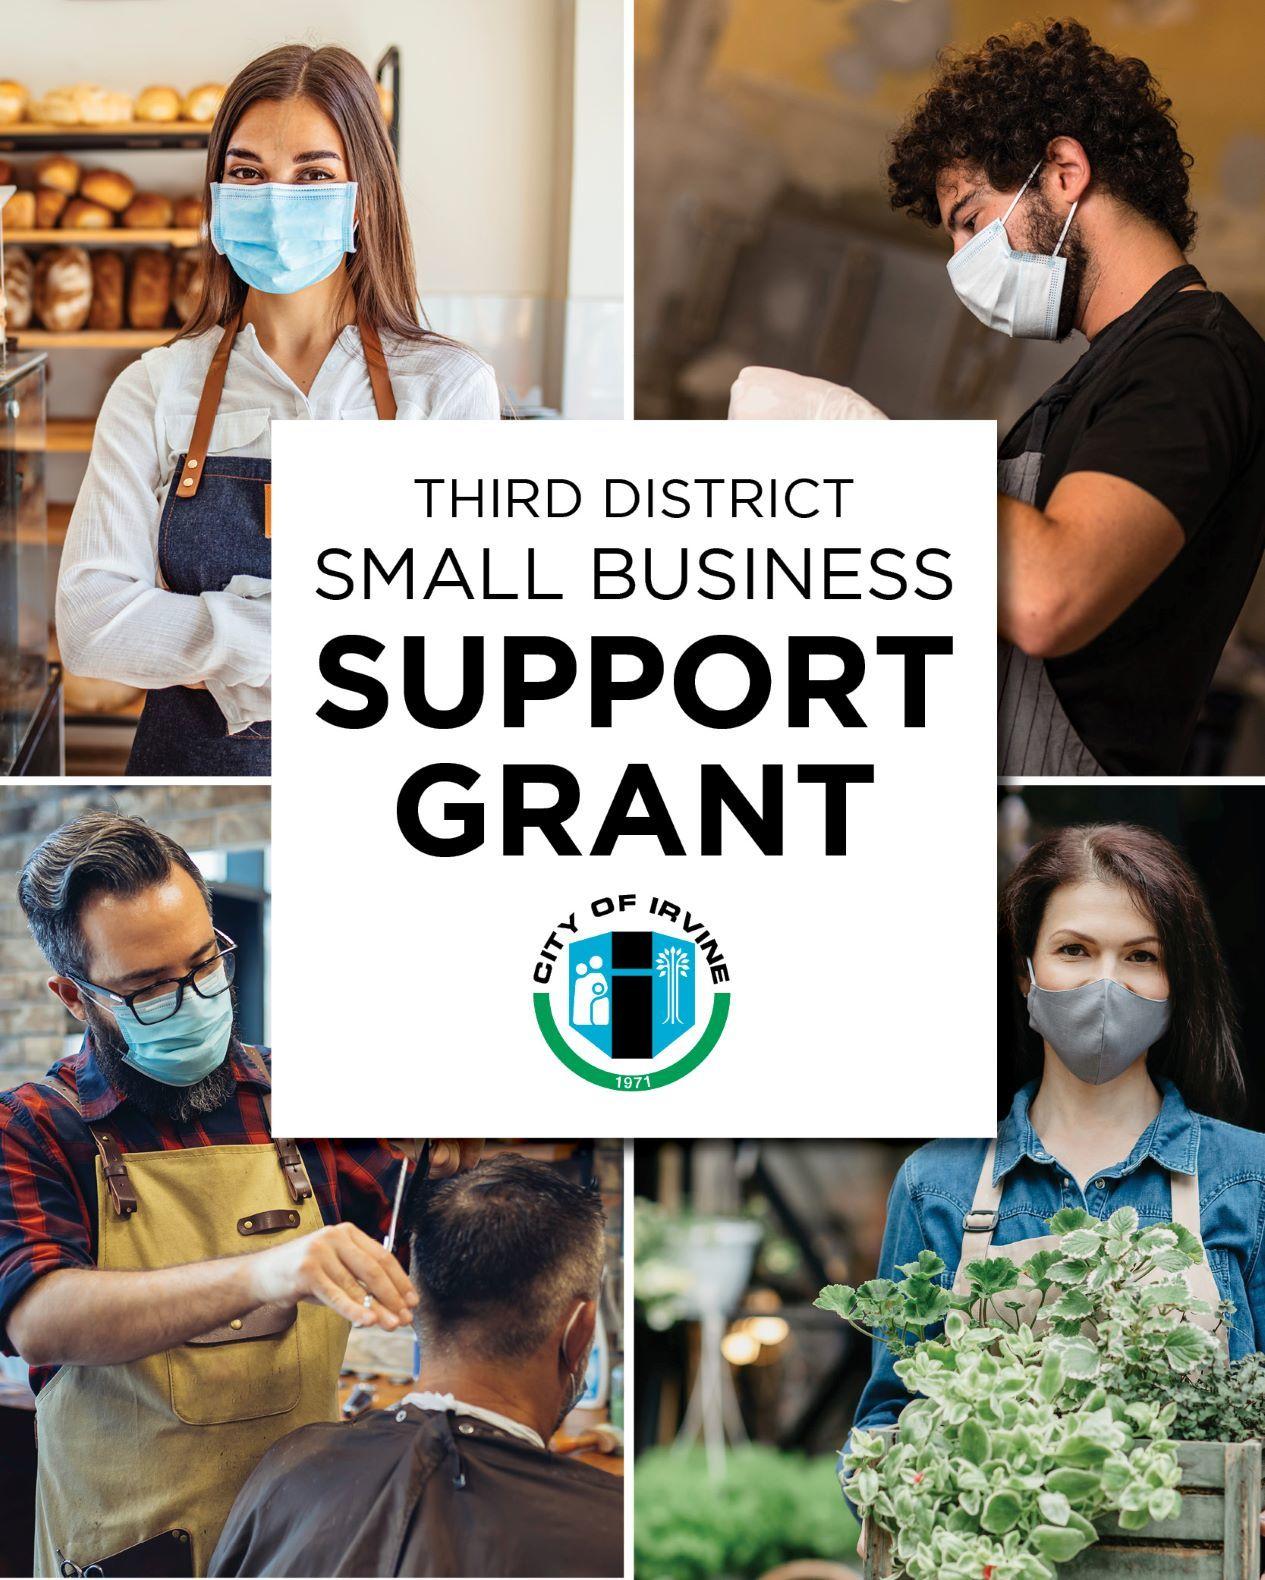 Third District Grant Program